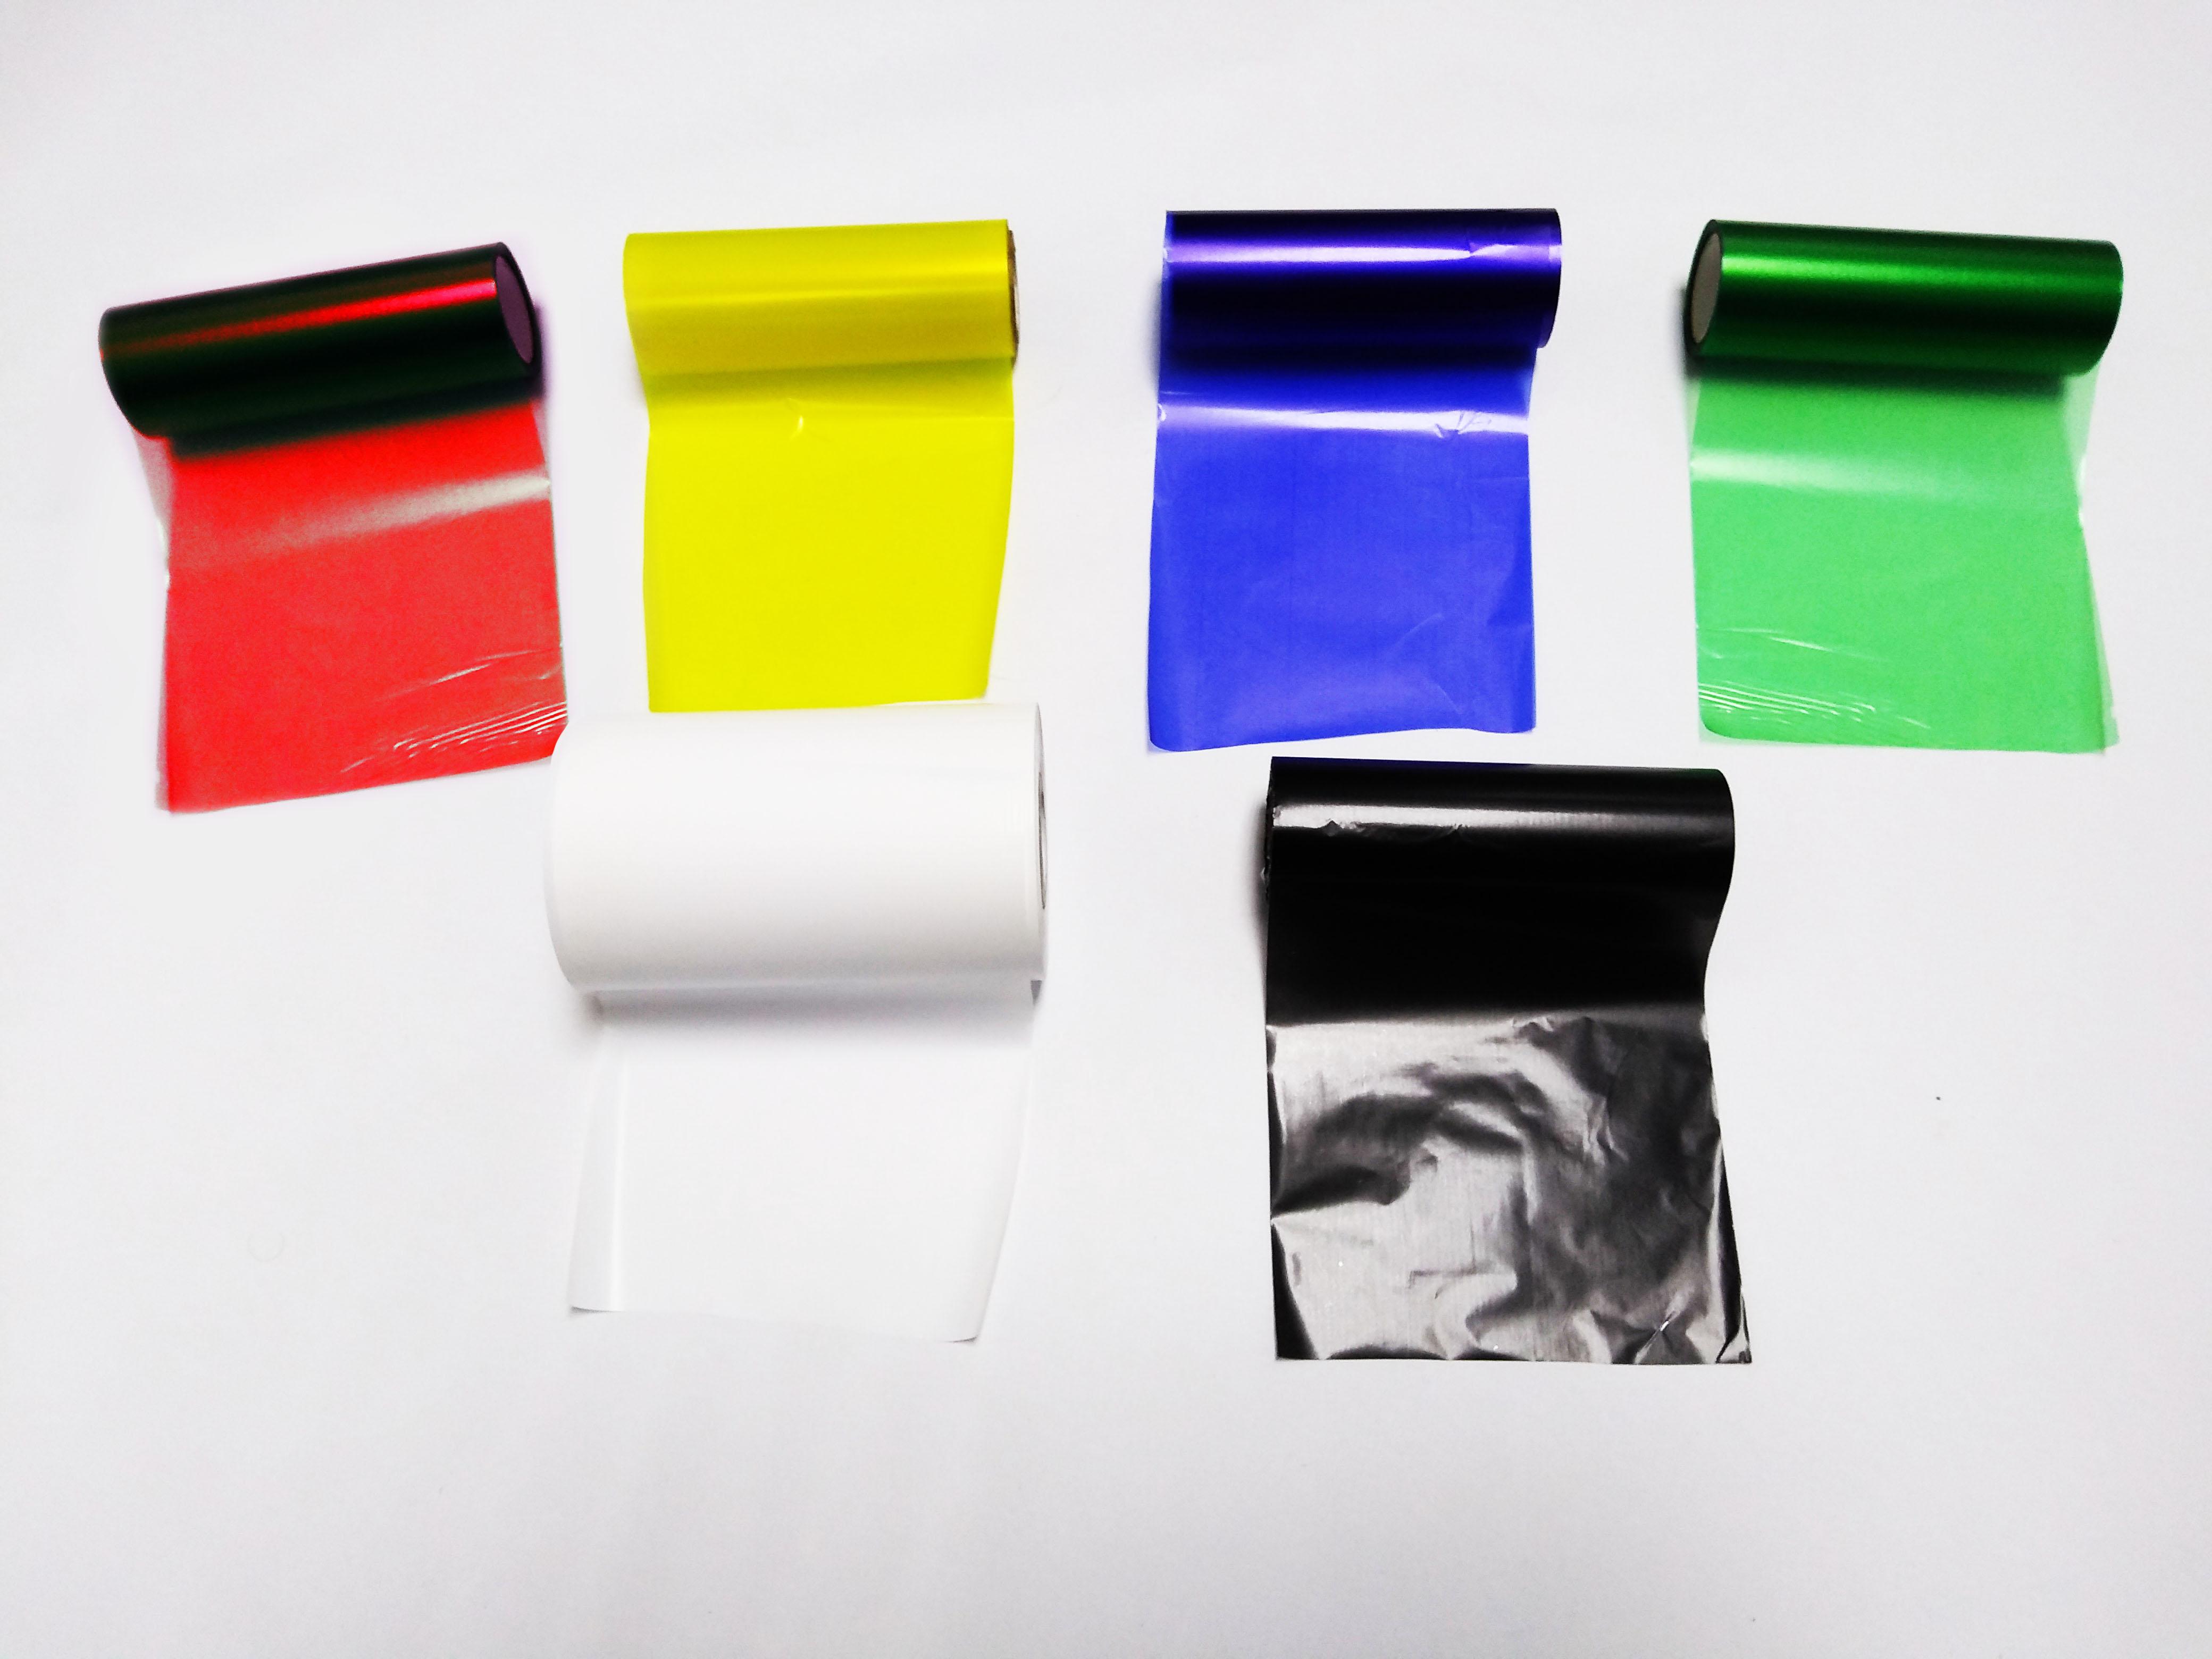 ribbons e etiquetas adesivas